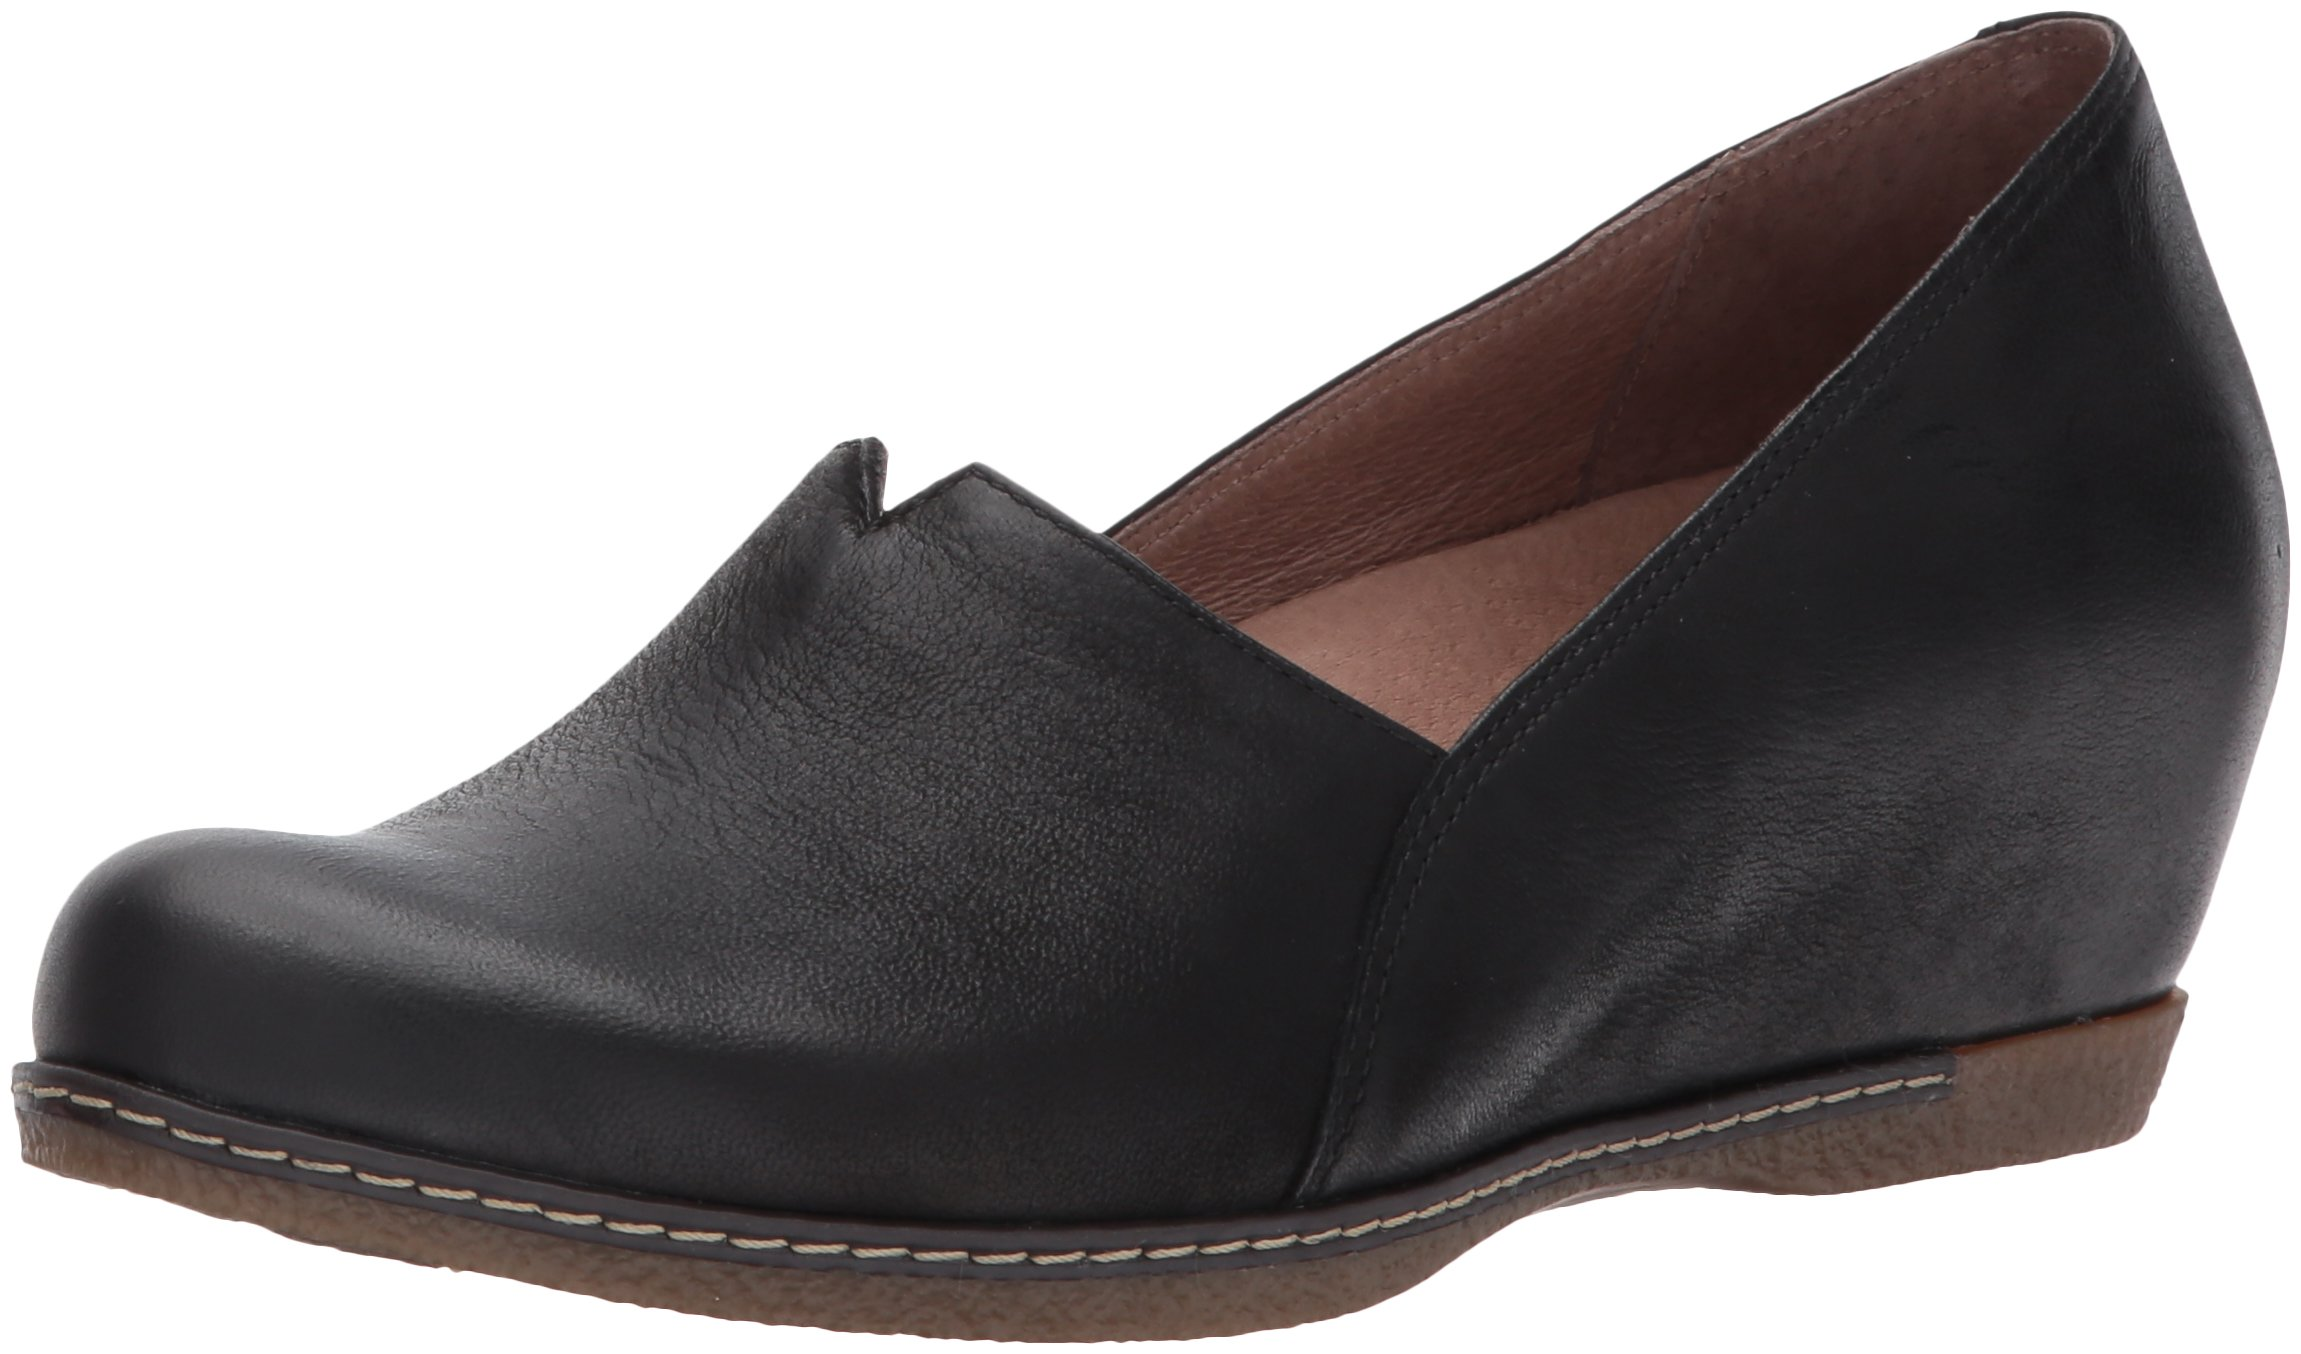 Dansko Women's Liliana Loafer Flat Black Burnished Nubuck 42 M EU (11.5-12 US)